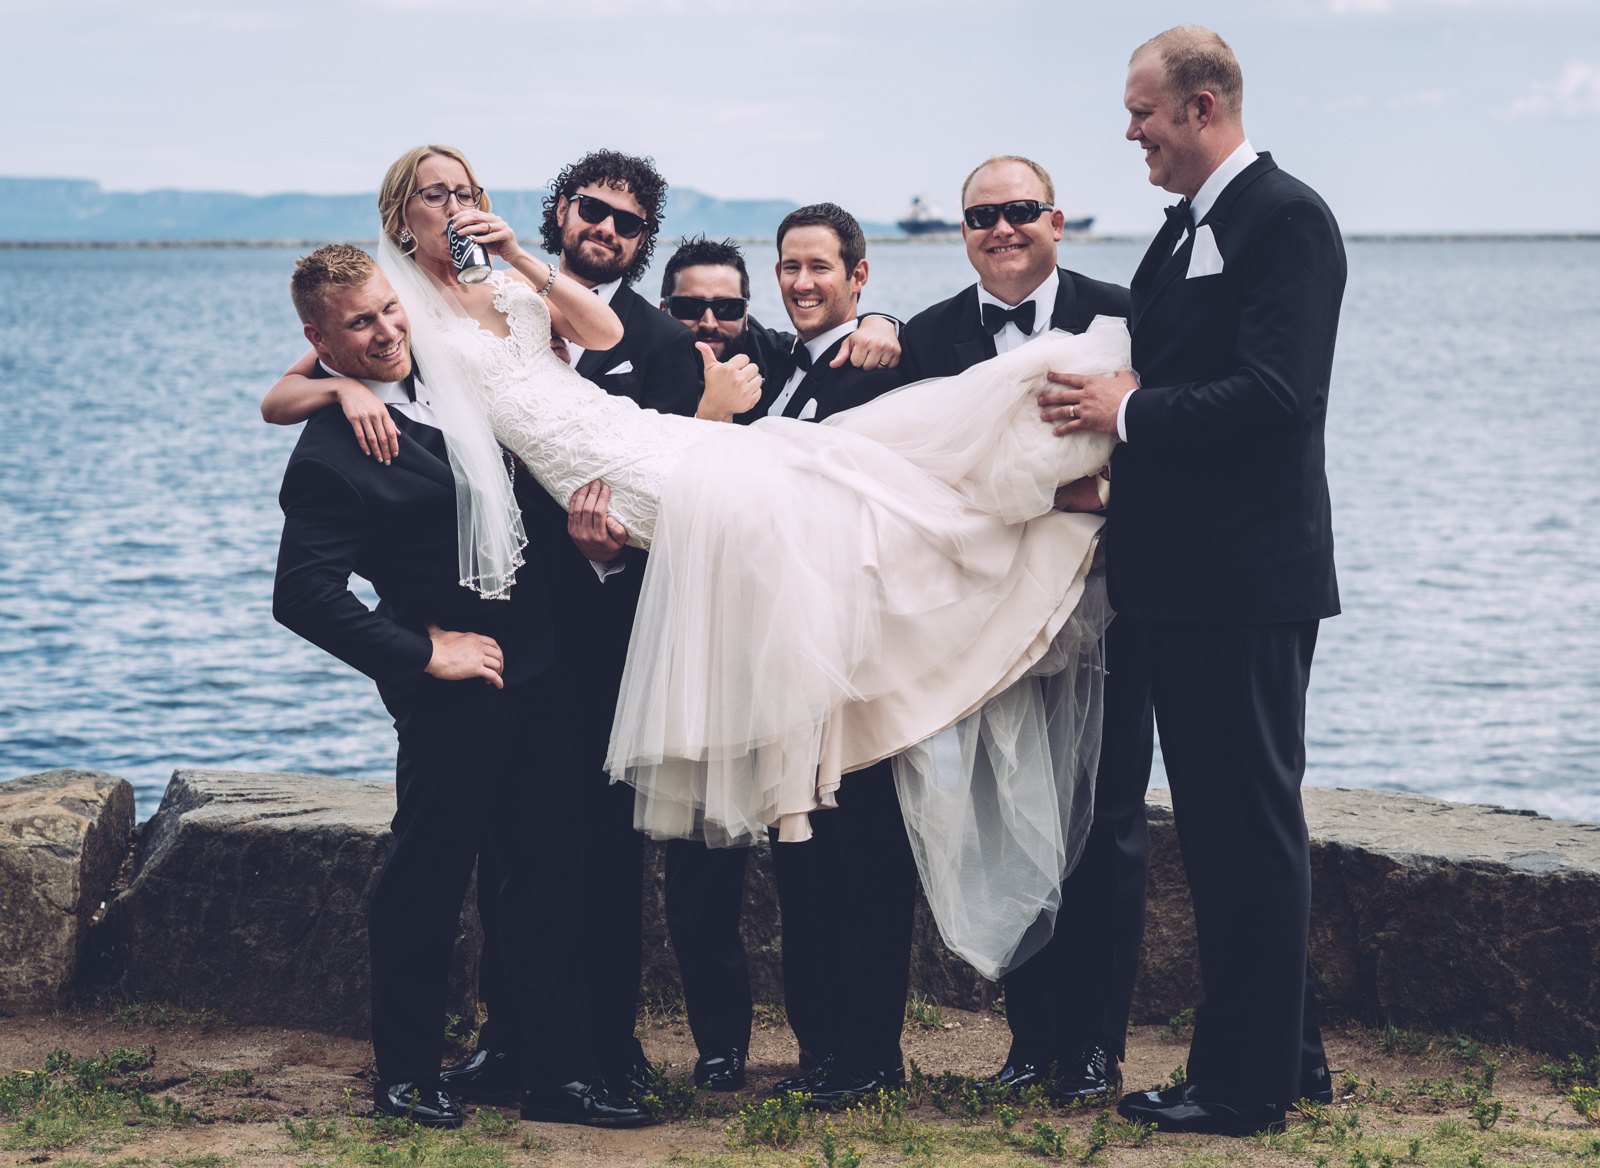 jessica_jonathon_wedding_blog69.jpg